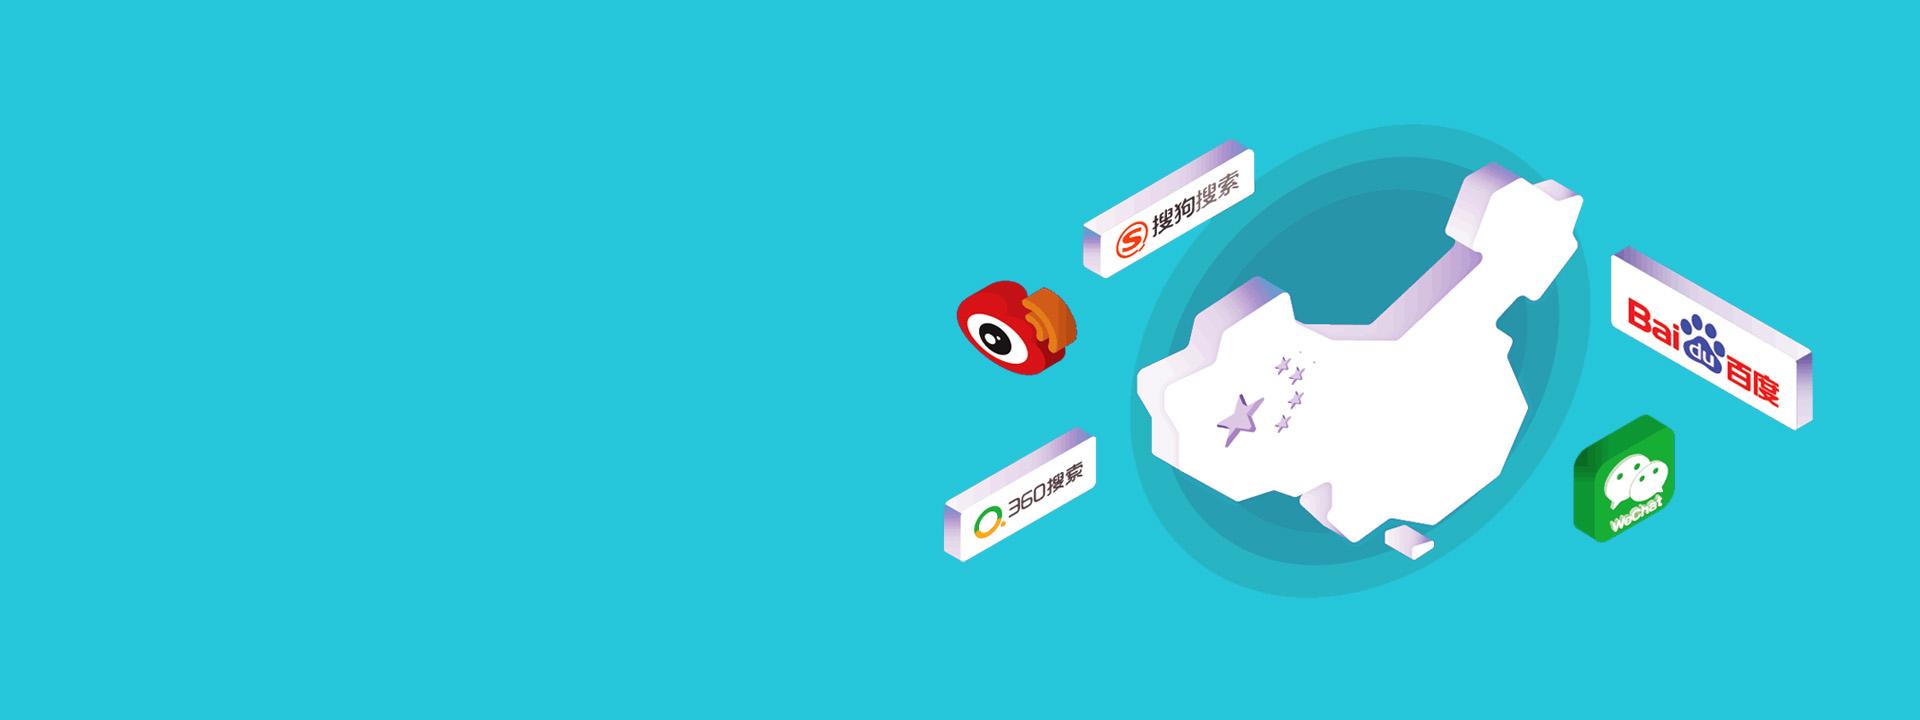 iStarto-Baidu Ad banner02